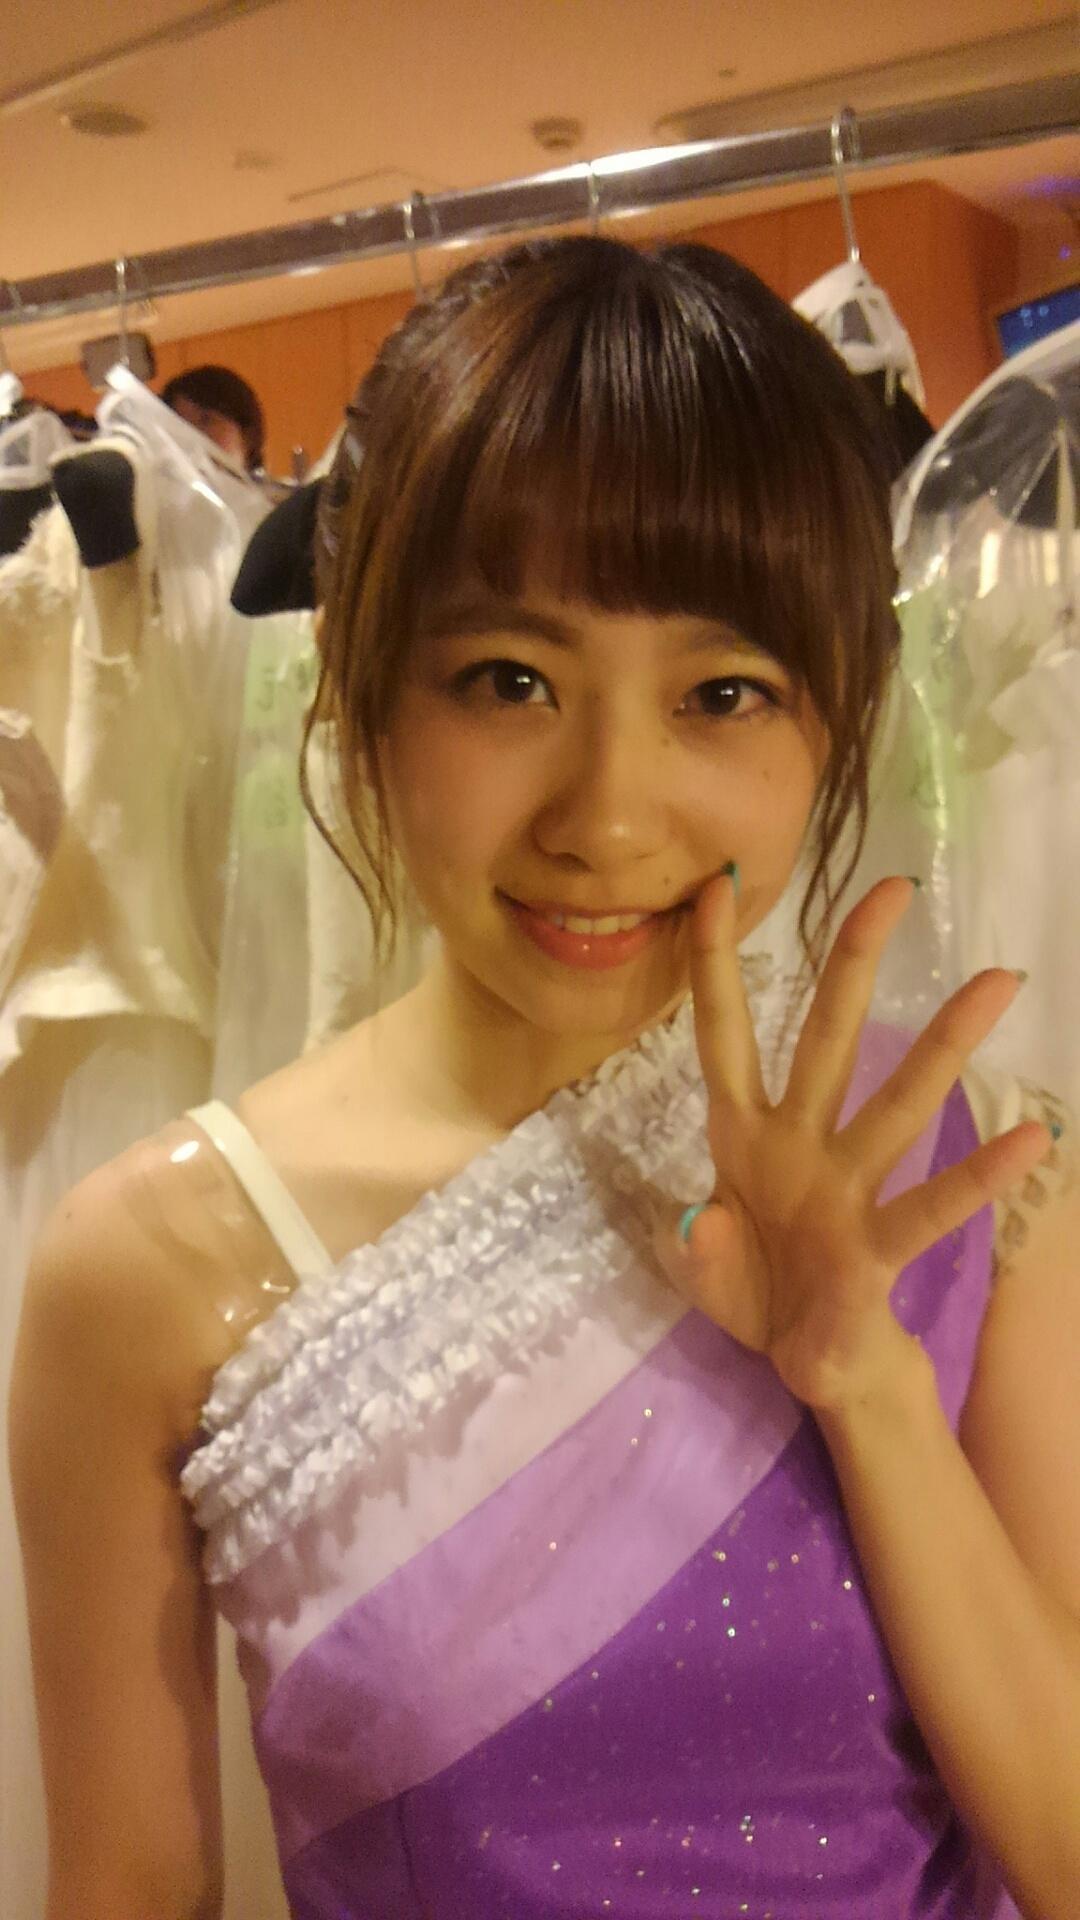 AKB48】岡田彩花 画像まとめ【あ...